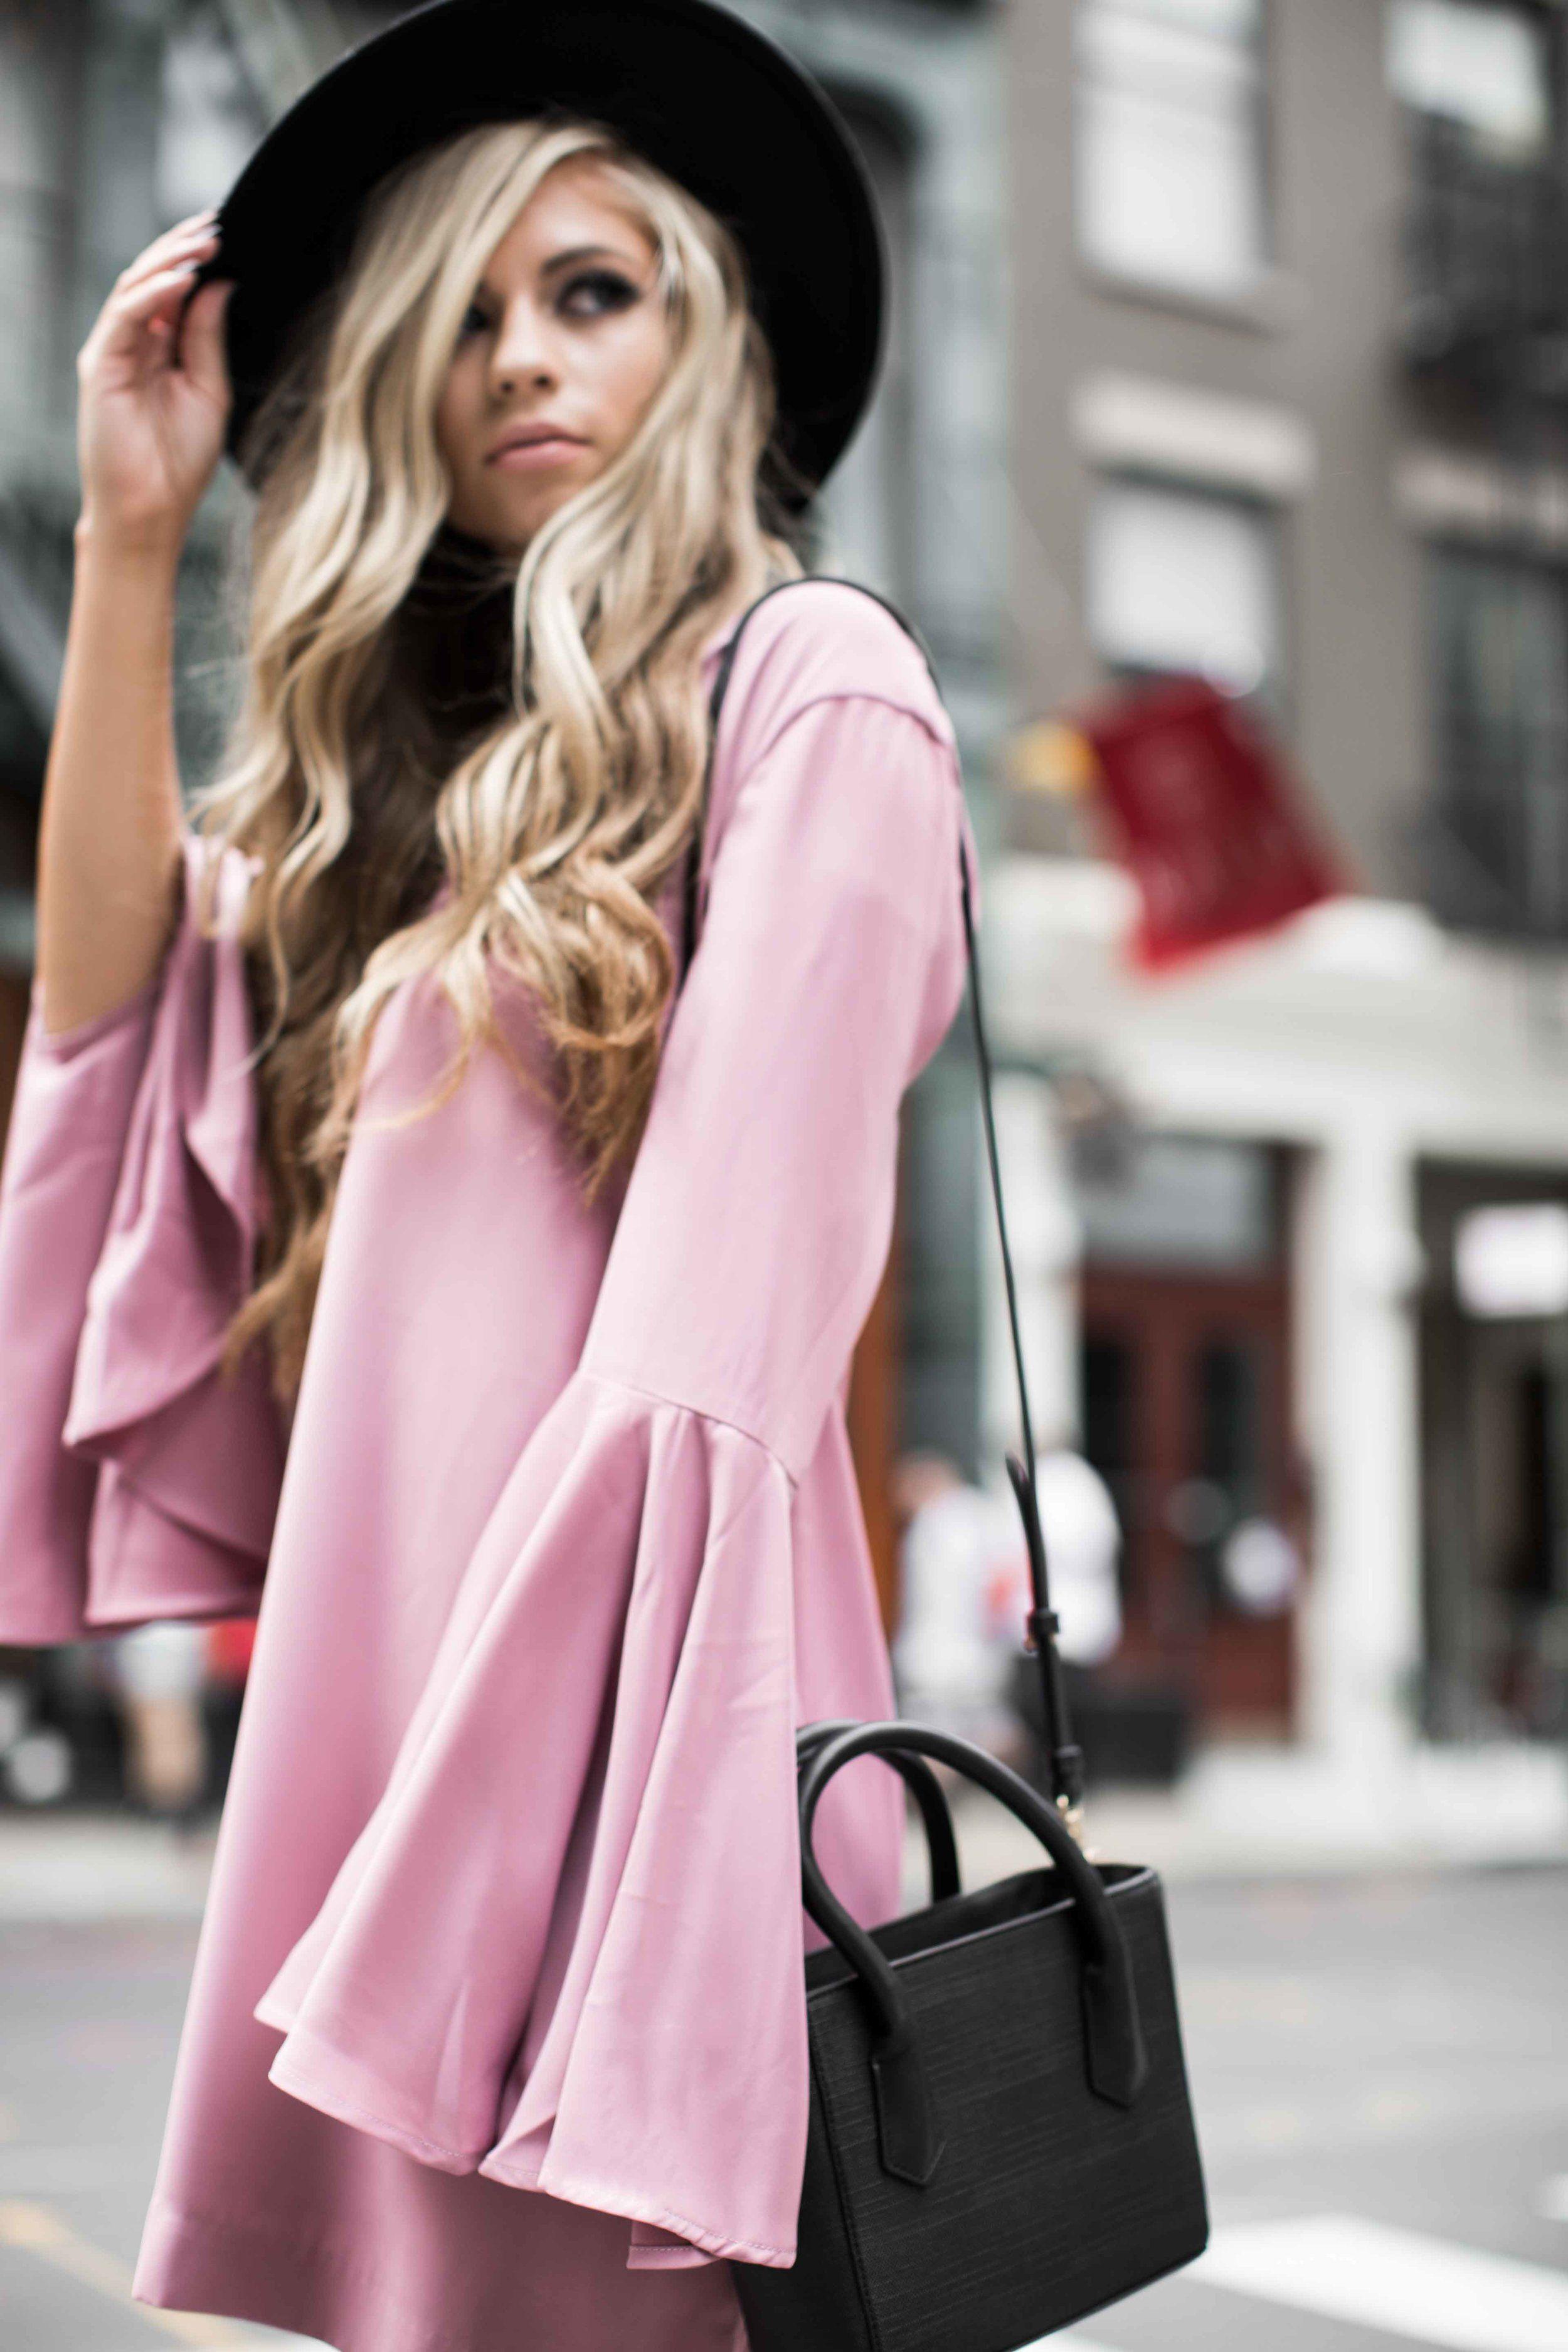 the pink dress | My dream ♥ | Pinterest